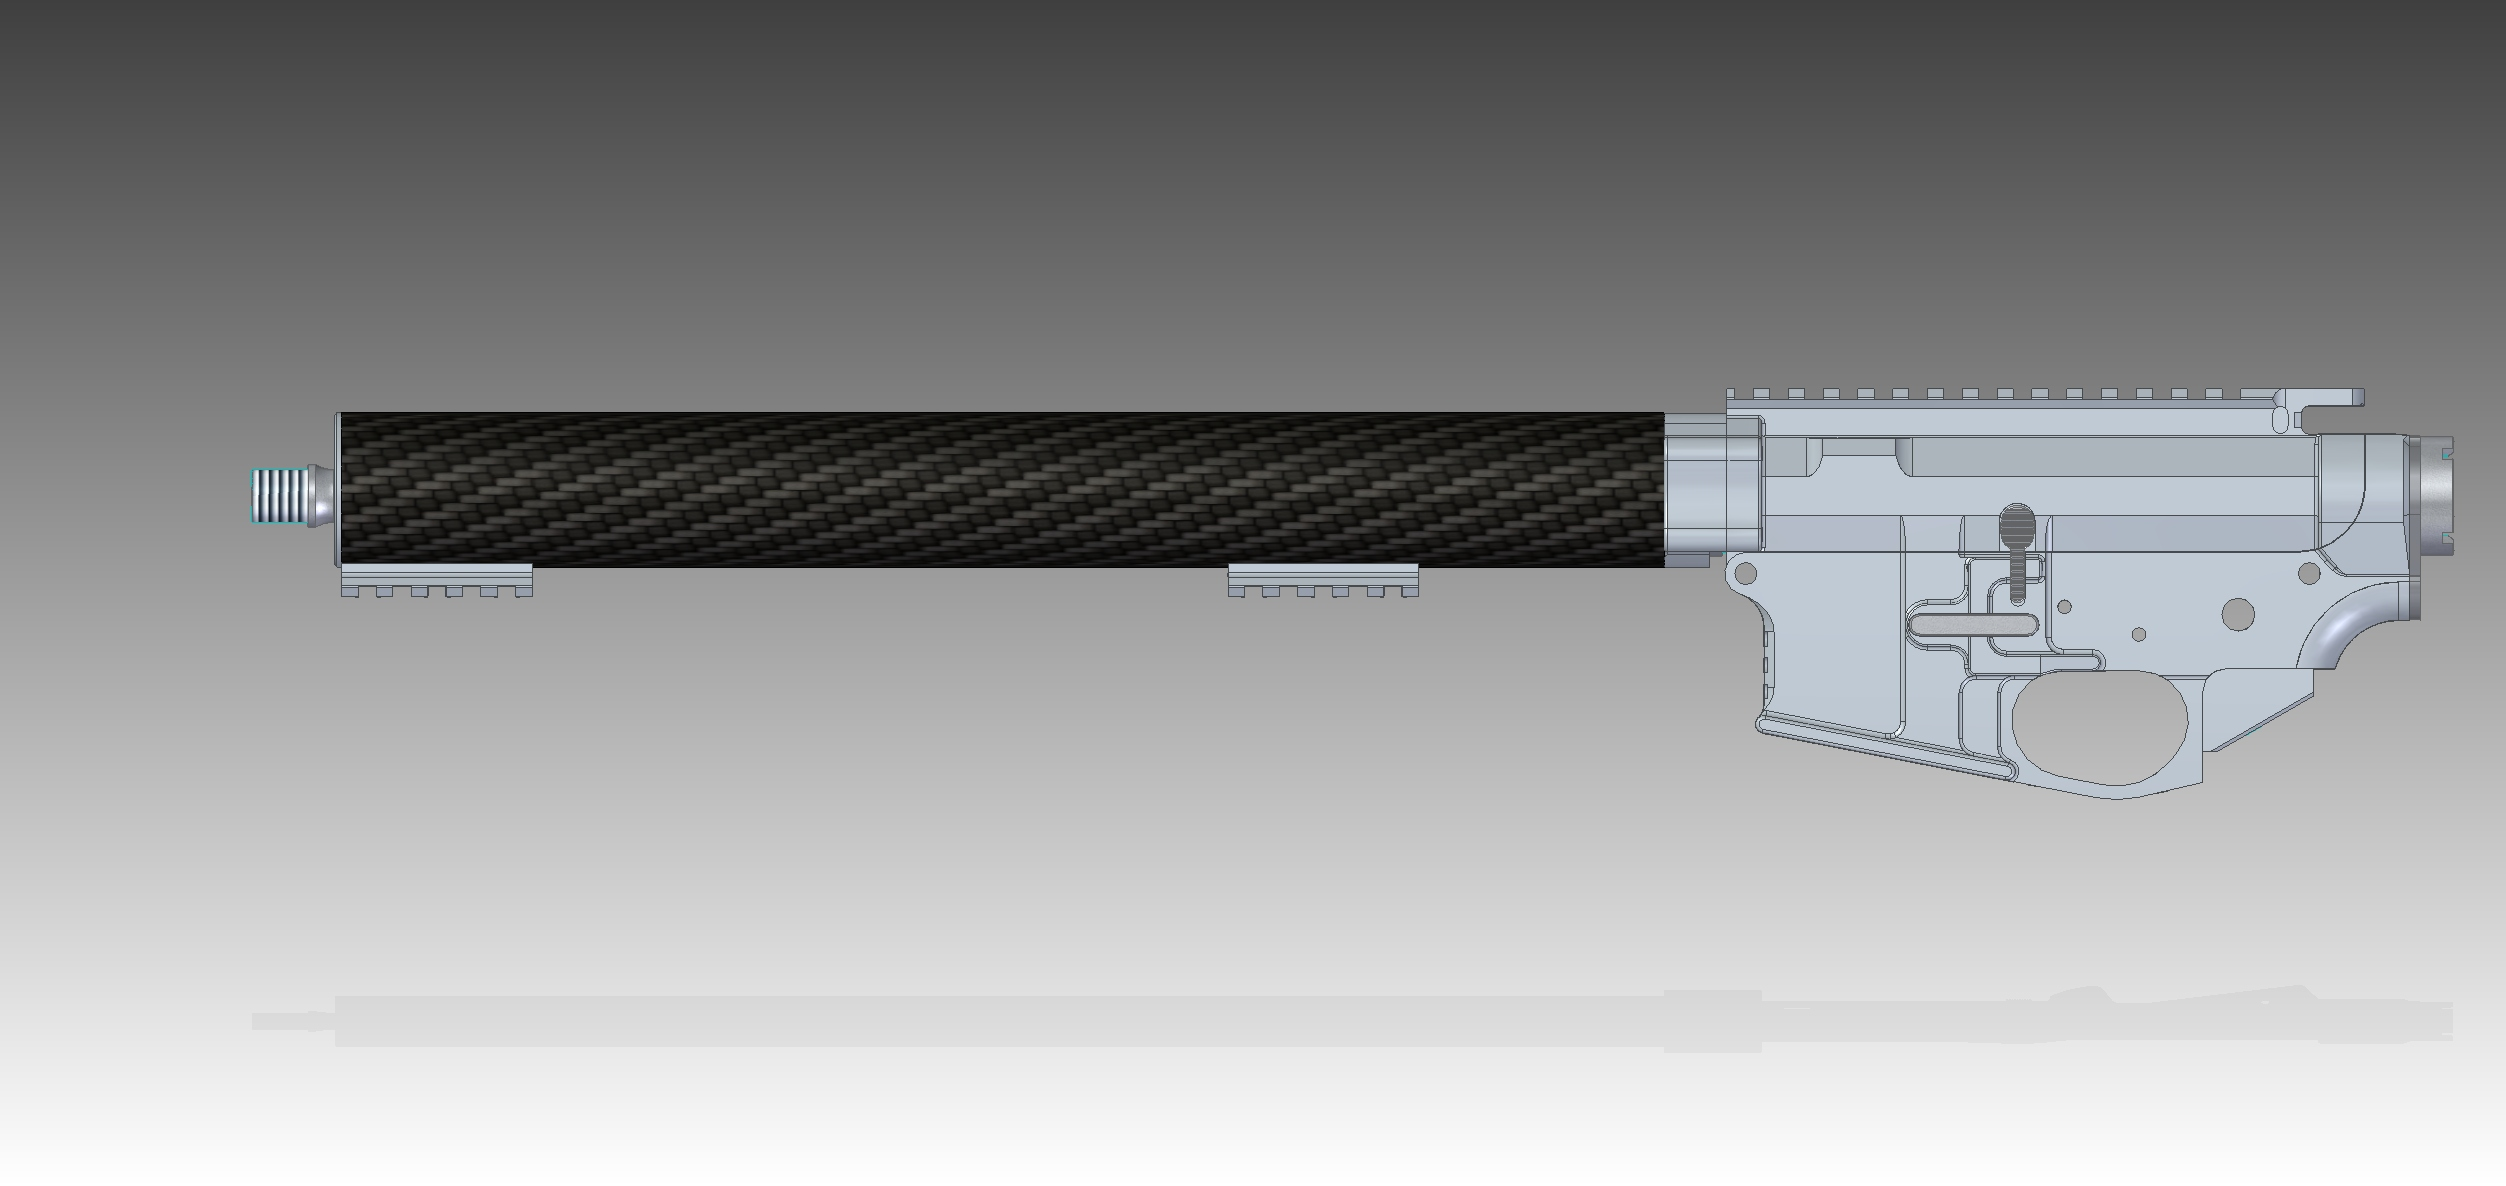 DAR IPSC DAR-15 CAD Preview 3